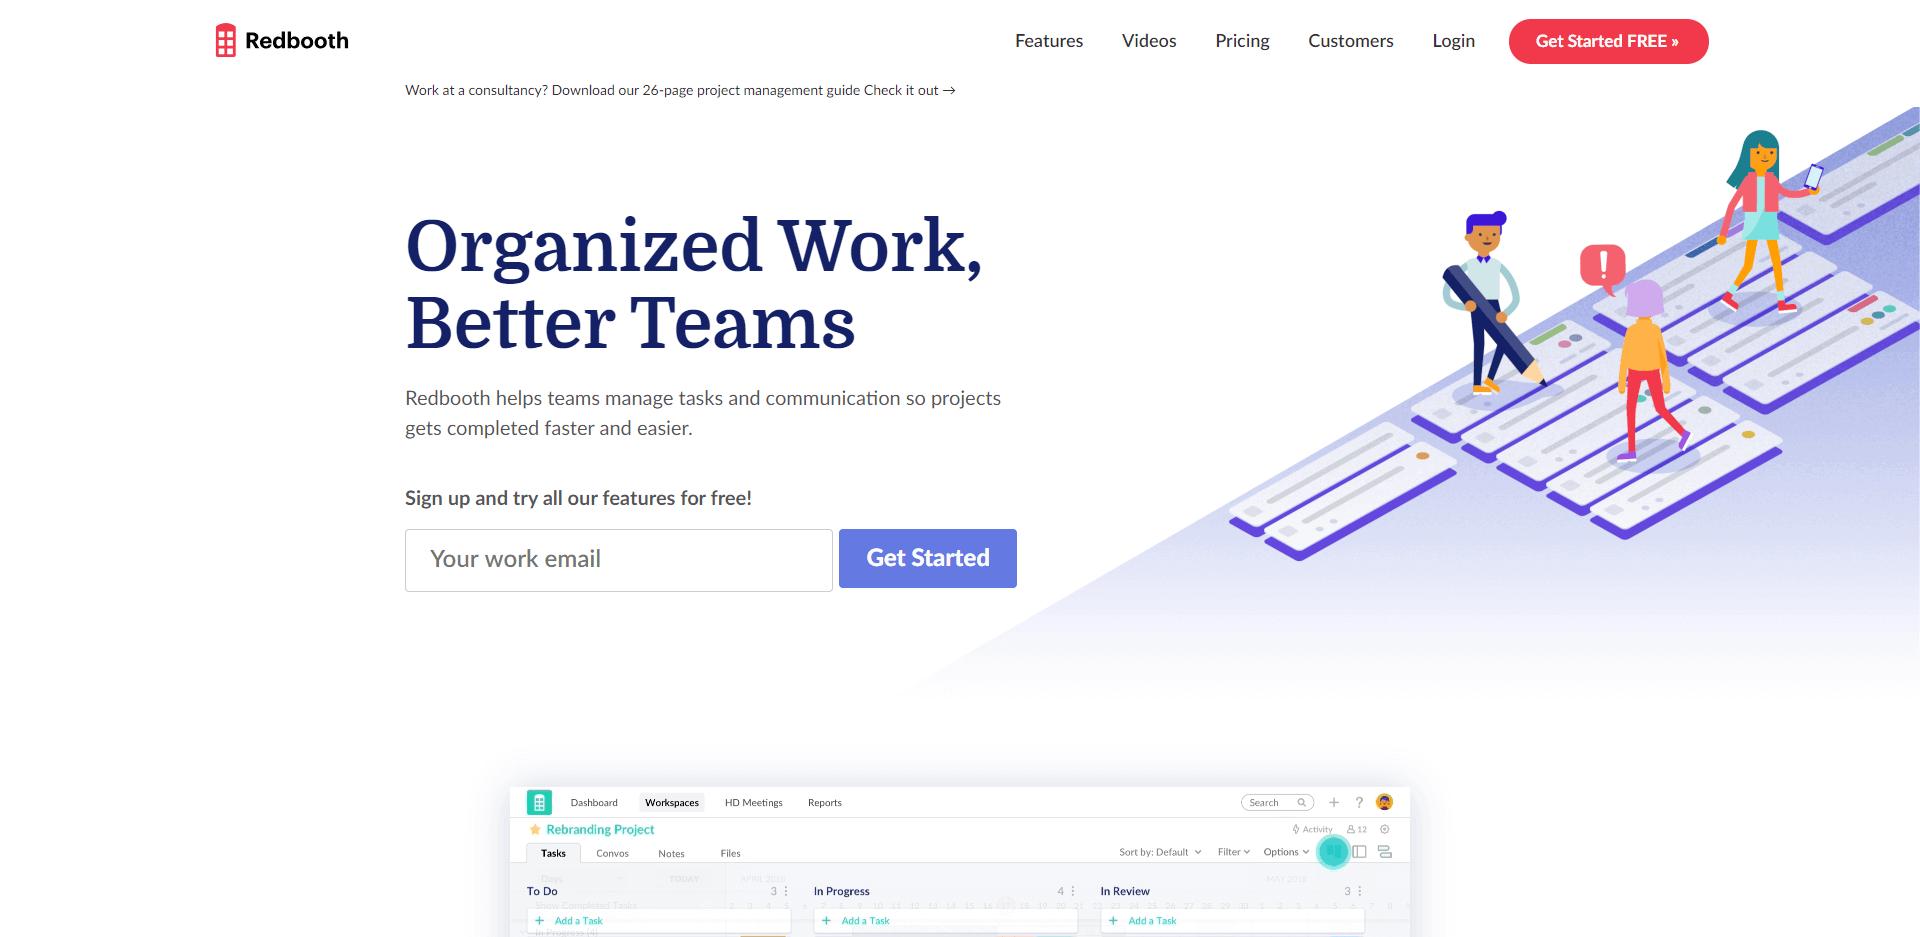 Redbooth allows organized work, better teams